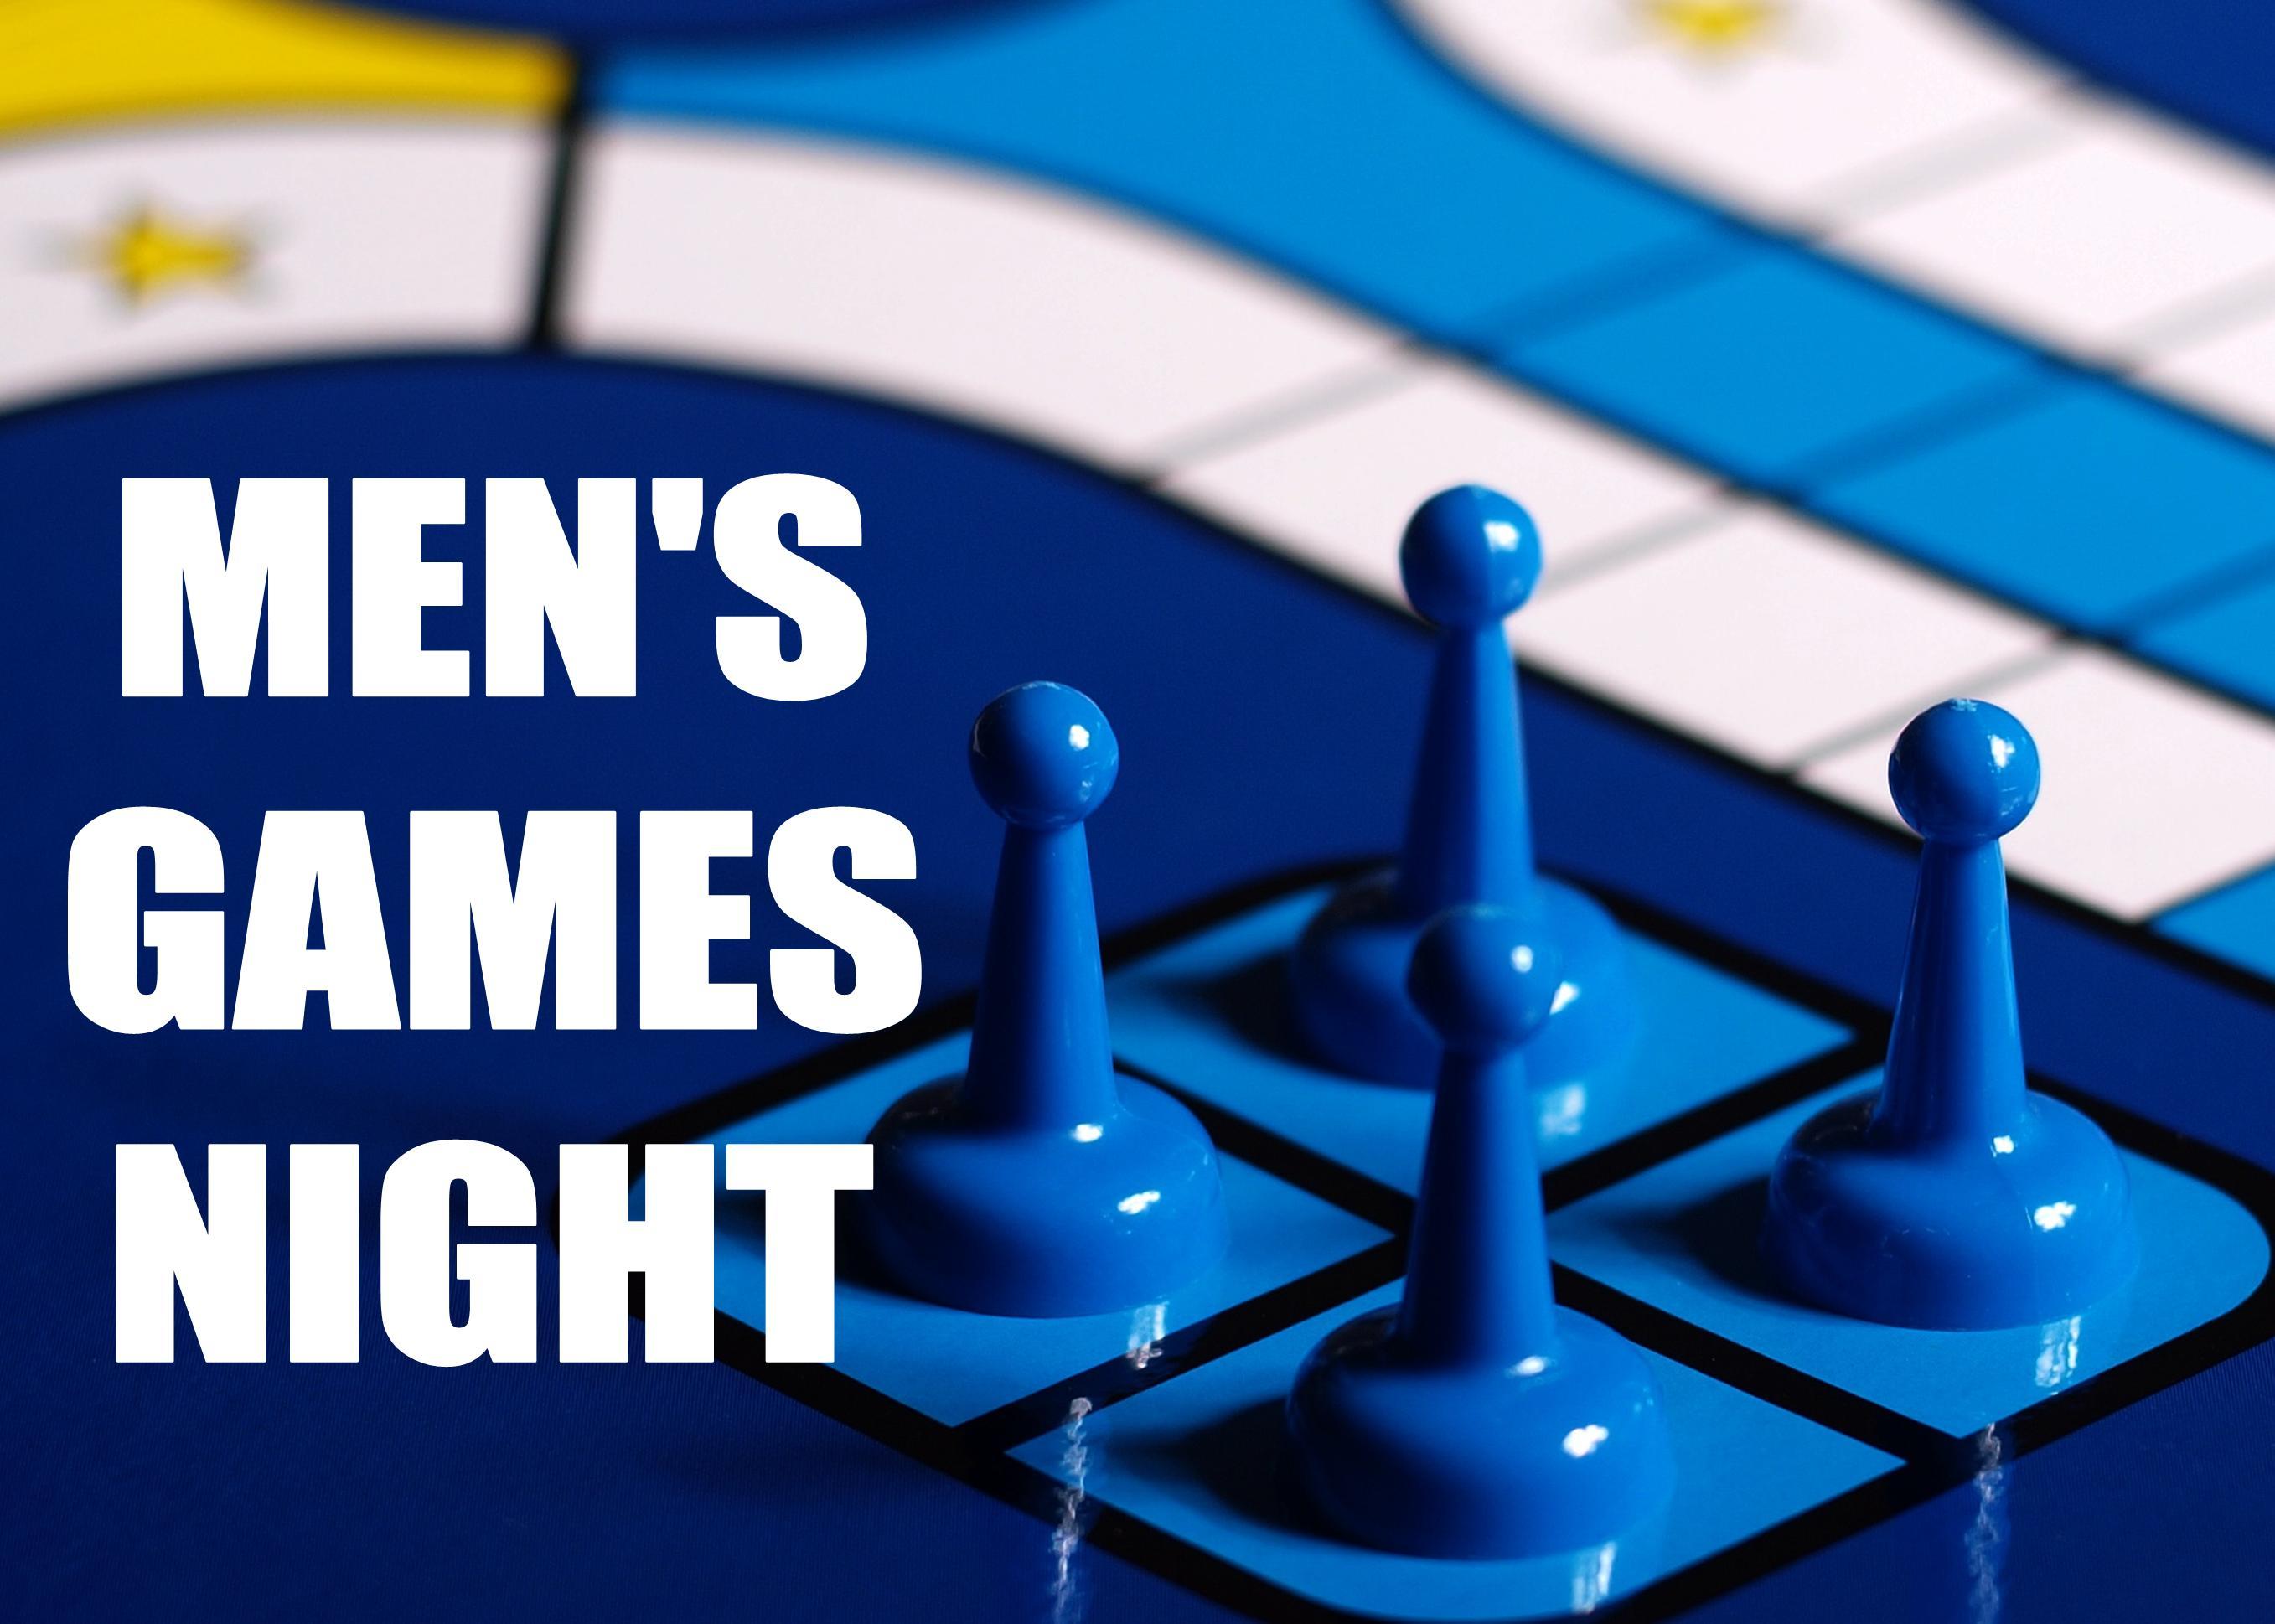 Westheights Men's Games Night